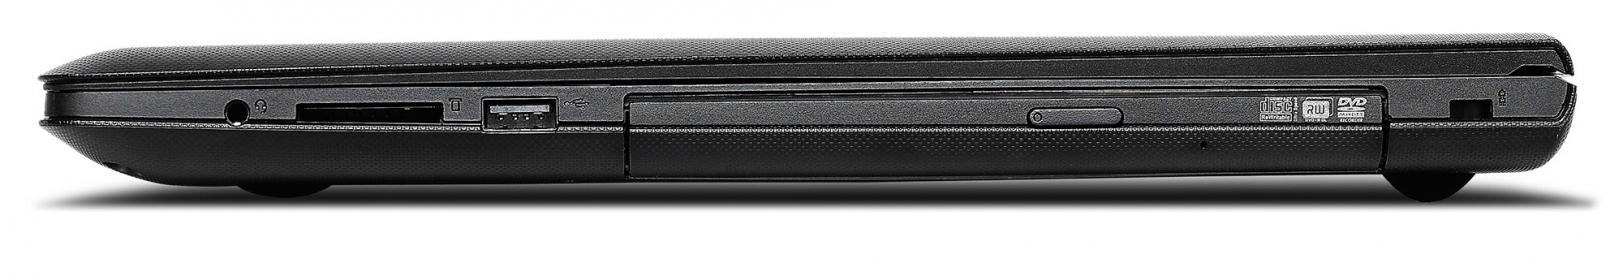 Lenovo IdeaPad Z50-75 80EC00HEHV Notebook